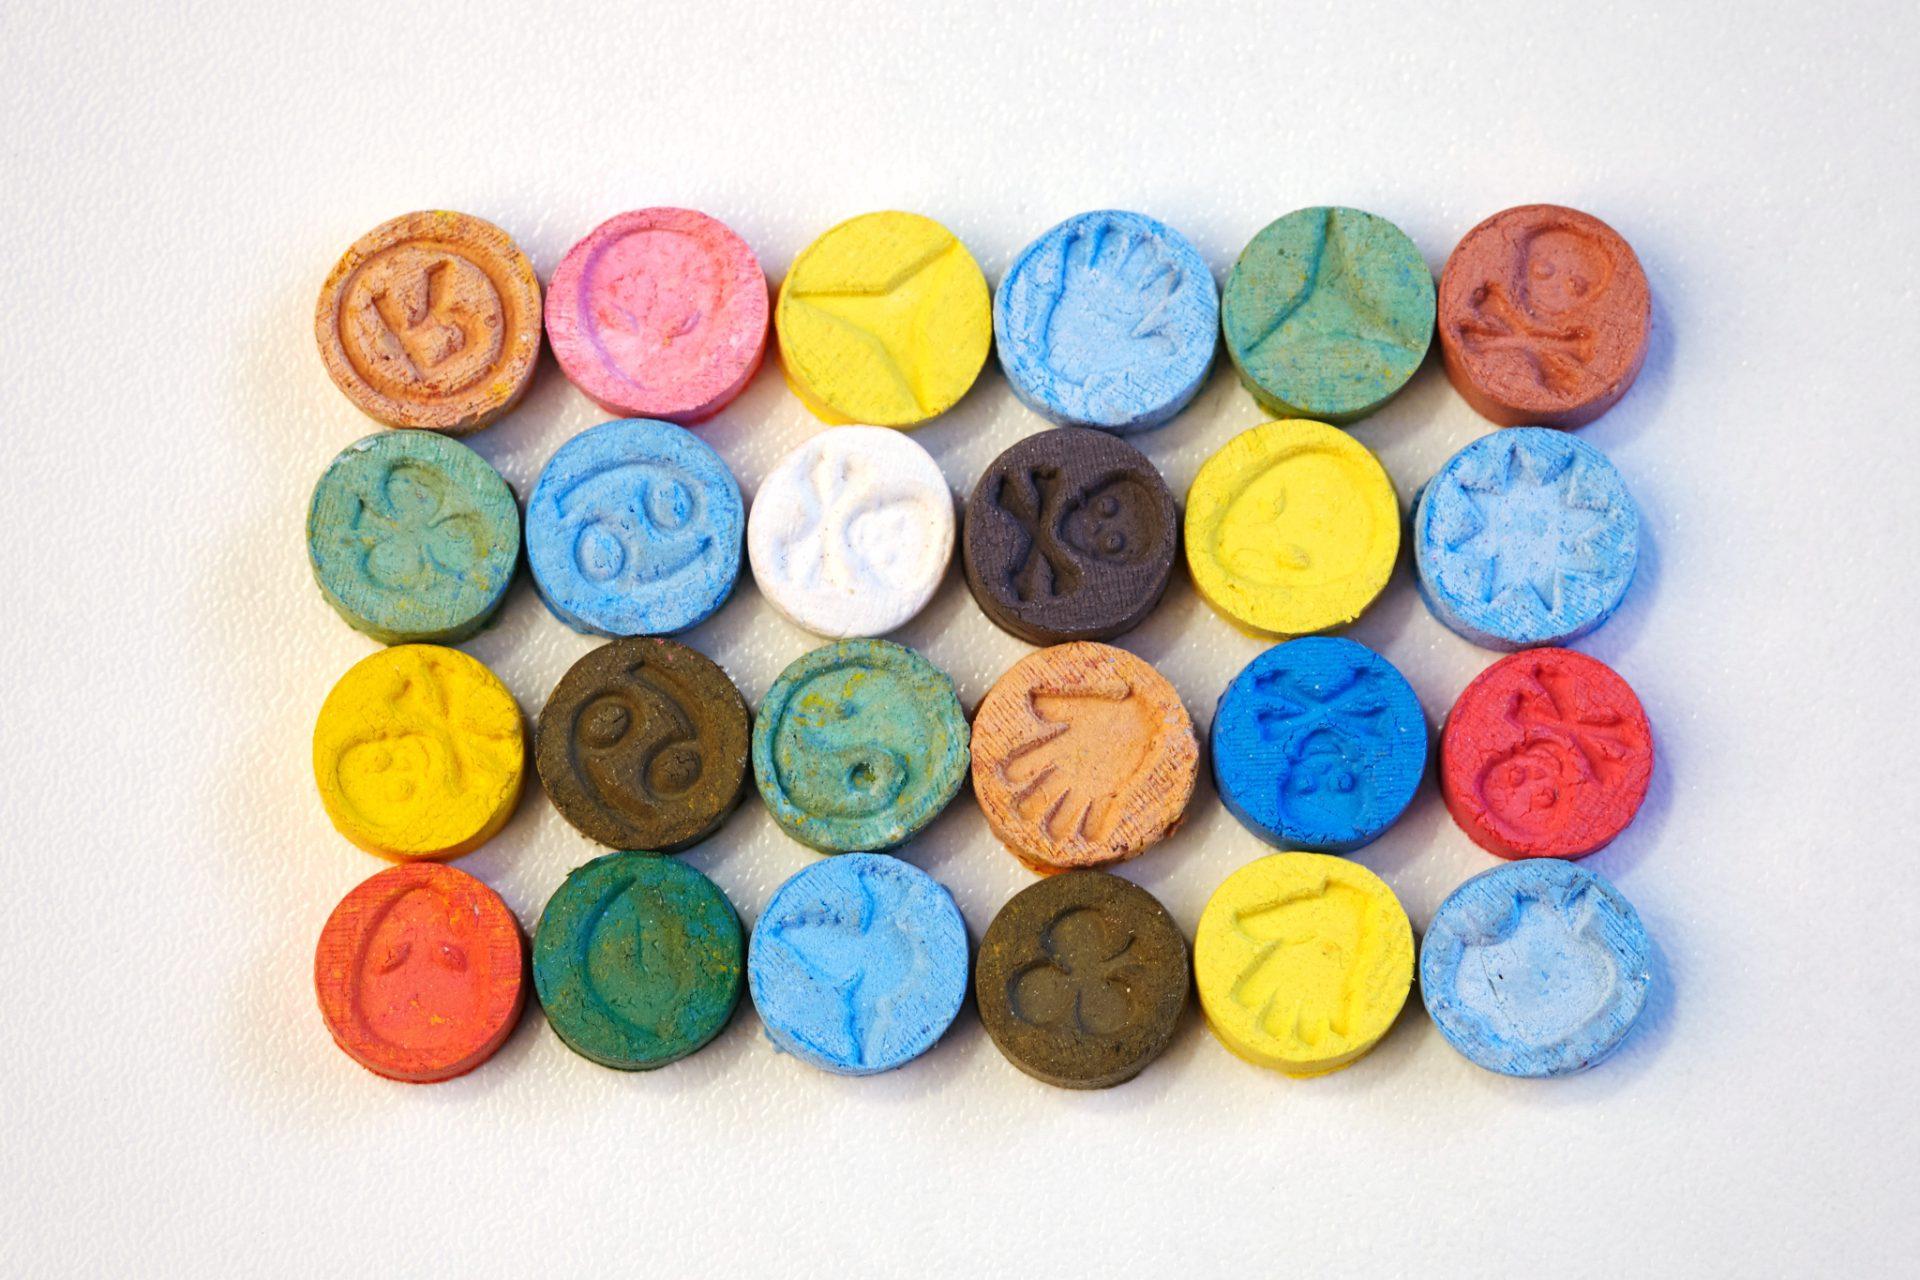 LAS - Possession of MDMA/Ecstasy